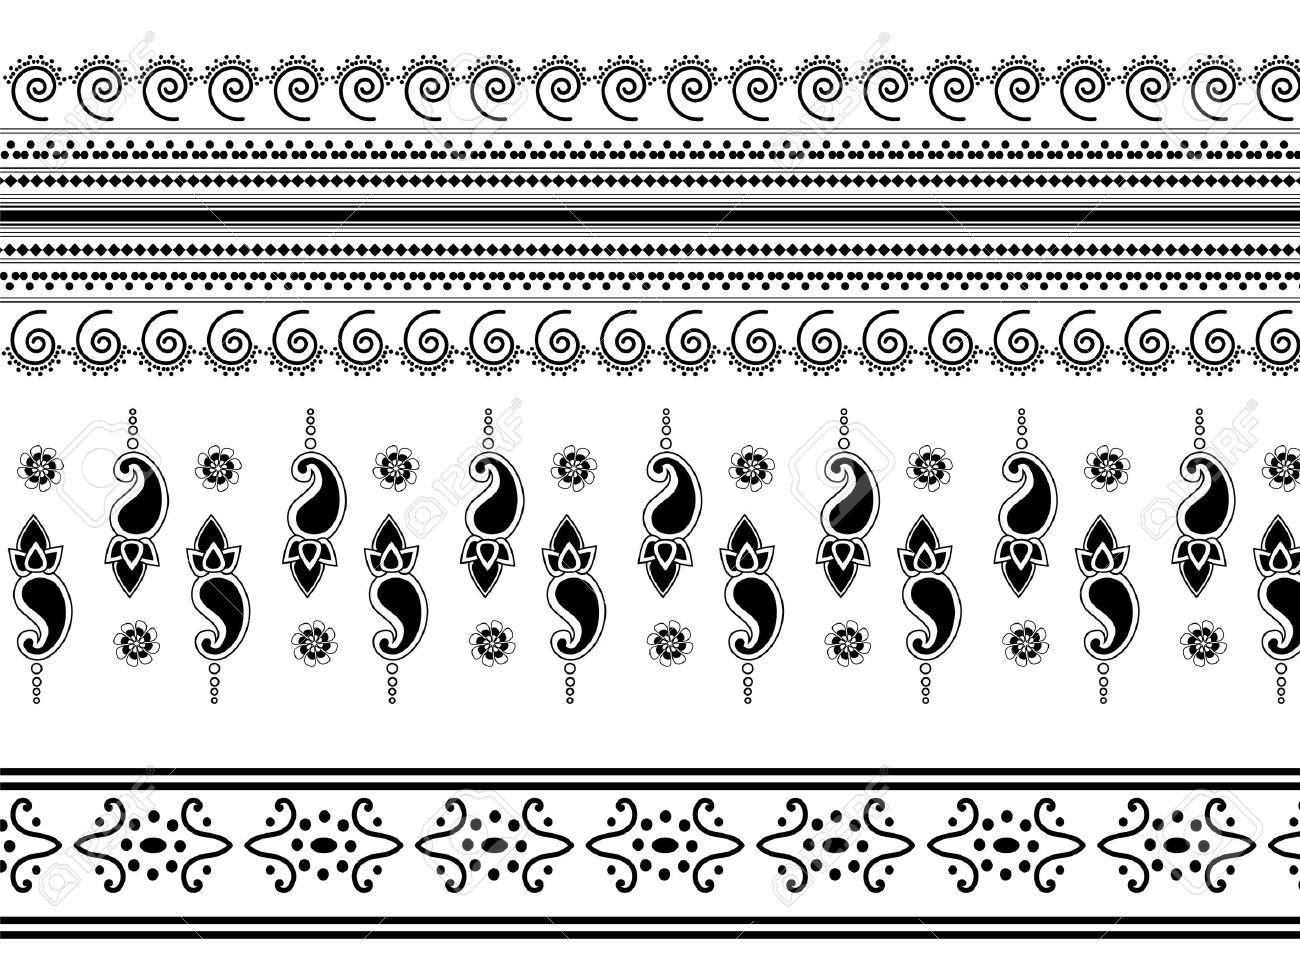 Indian art inspired henna borders.